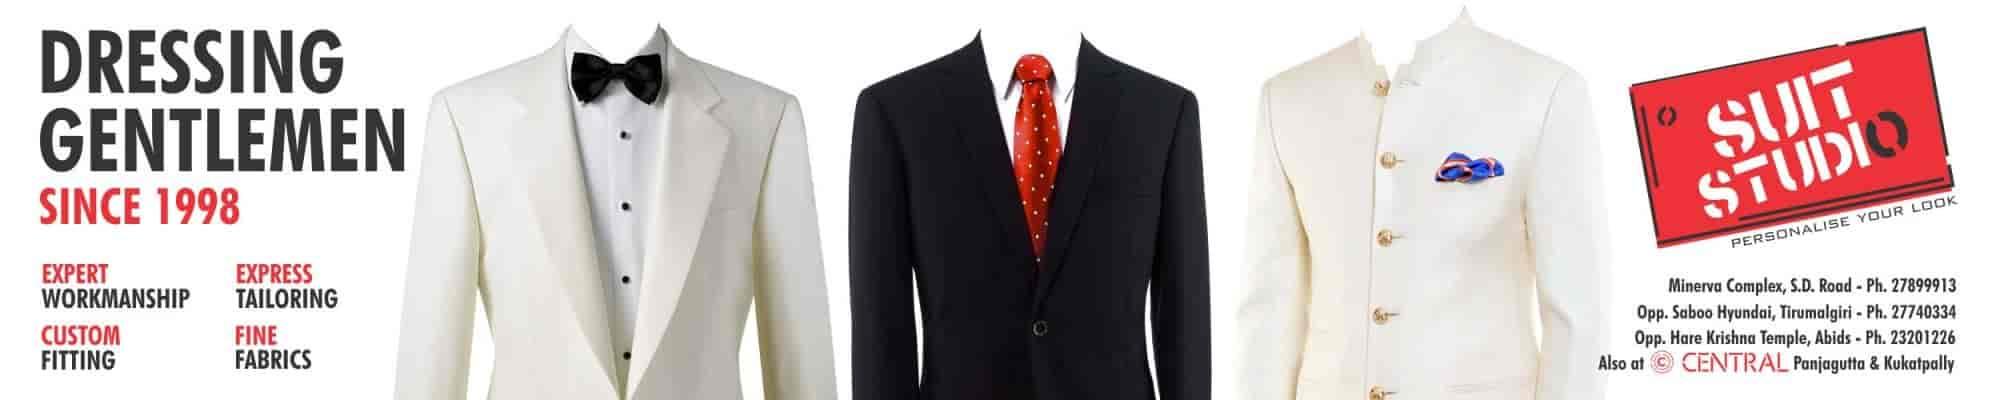 413442067e0 Suit Studio